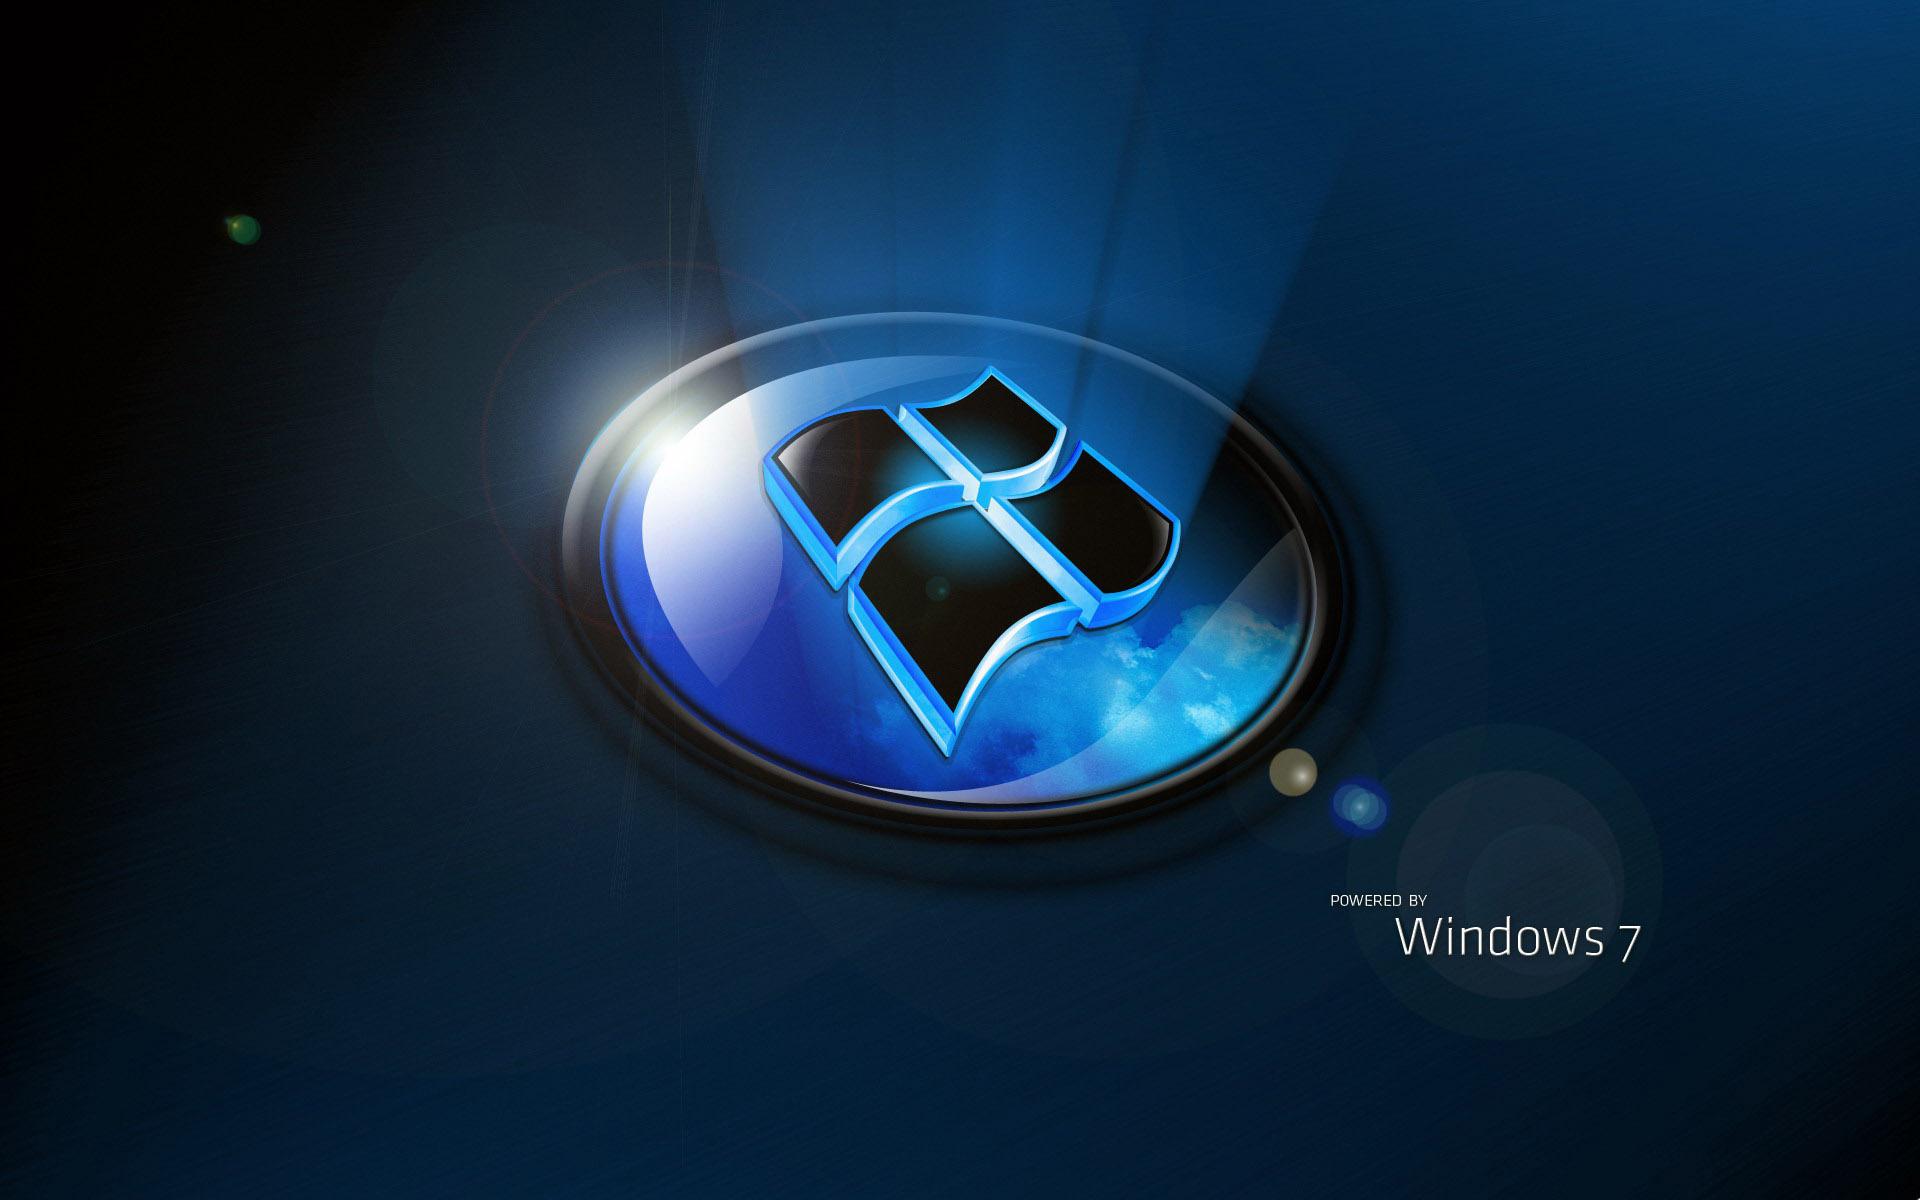 Wallpapers Windows 7 3D (84+)